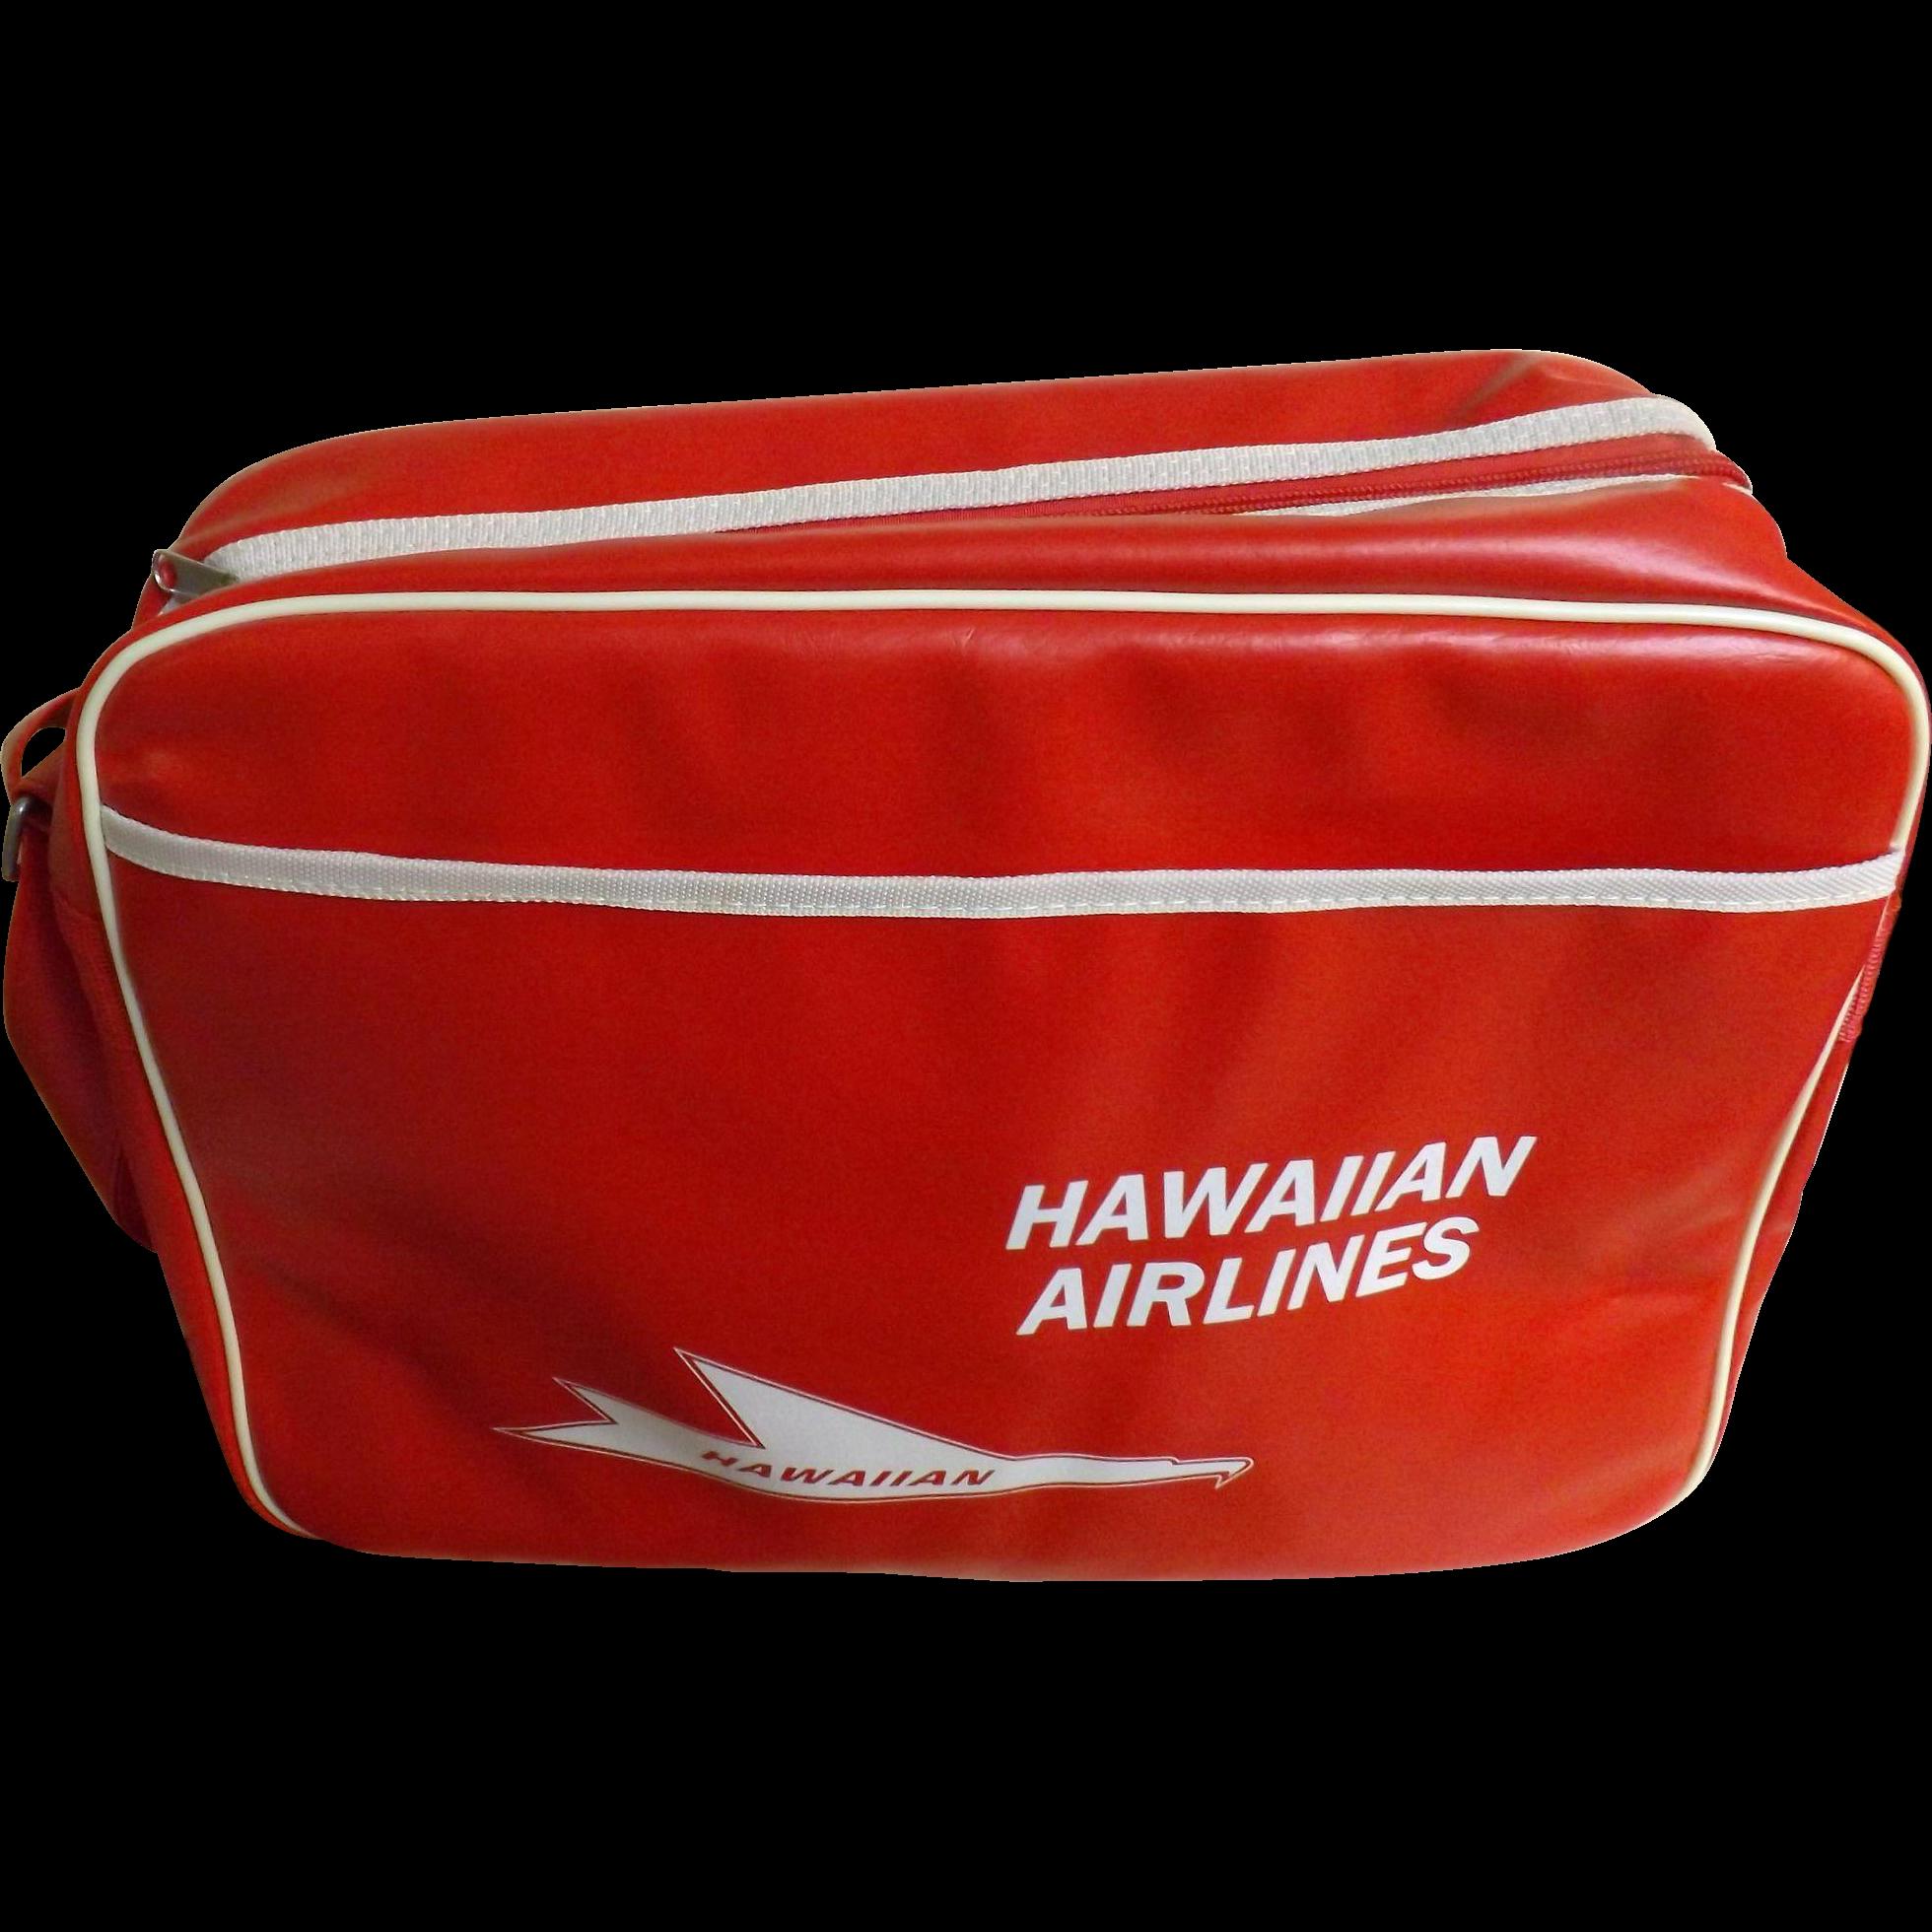 Hawaiian Airlines RETRO Cabin Bag